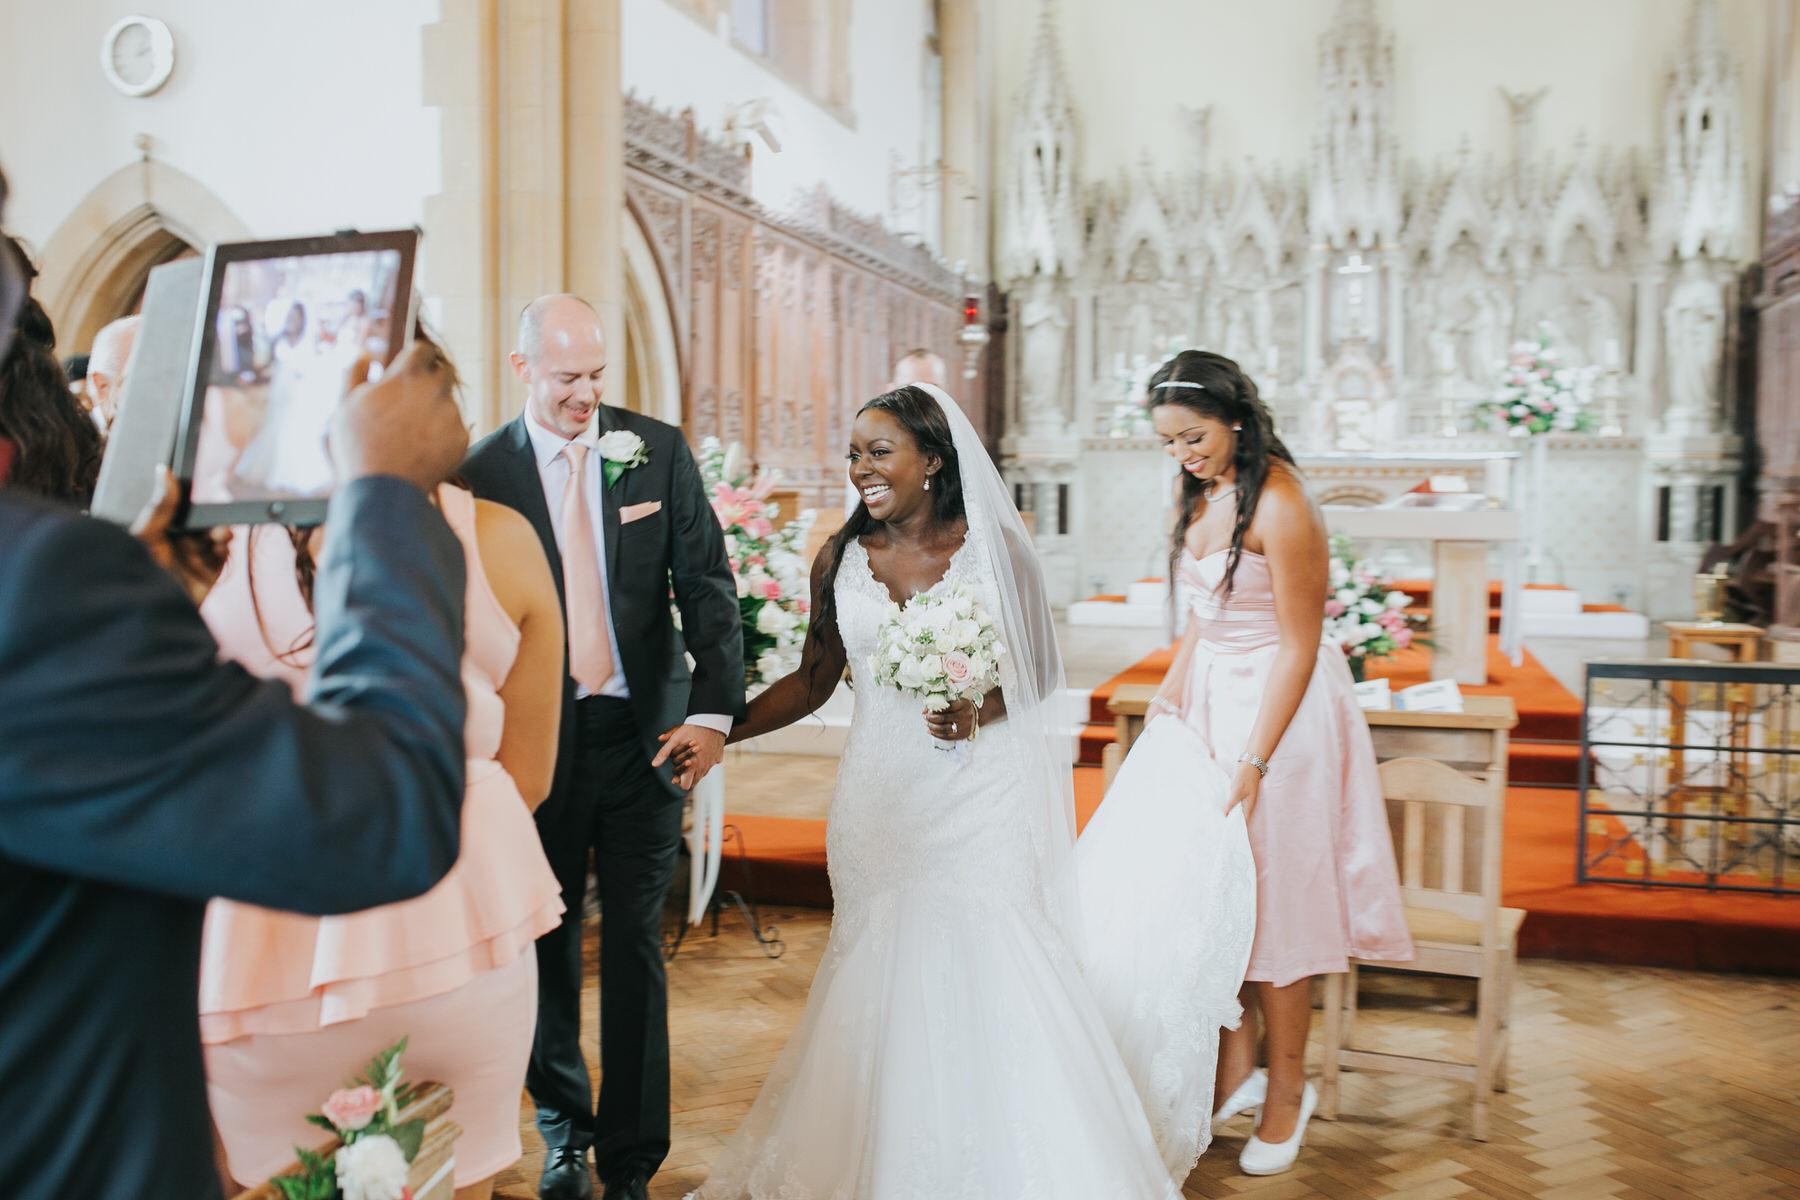 88 happy bride being papped by ipad bridesmaid straighten dress.jpg